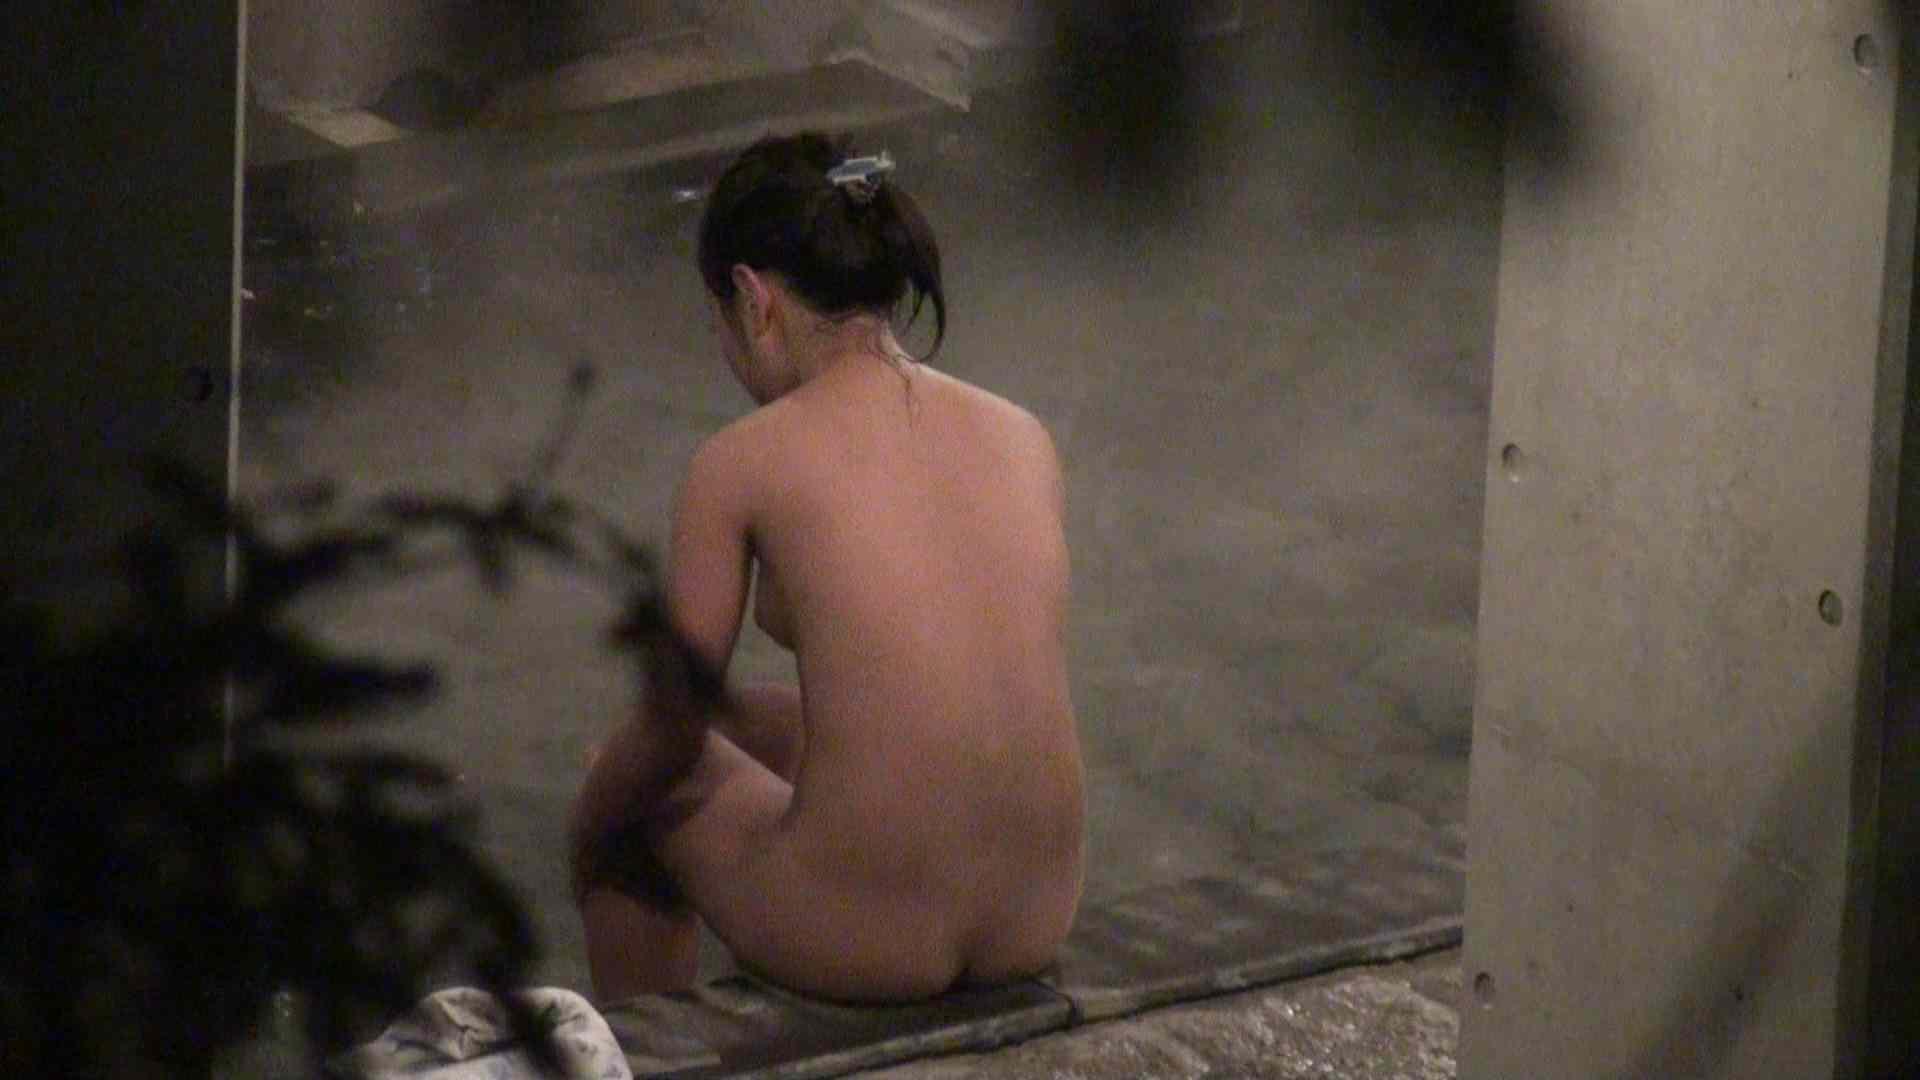 Aquaな露天風呂Vol.407 盗撮大放出 オメコ無修正動画無料 67連発 53